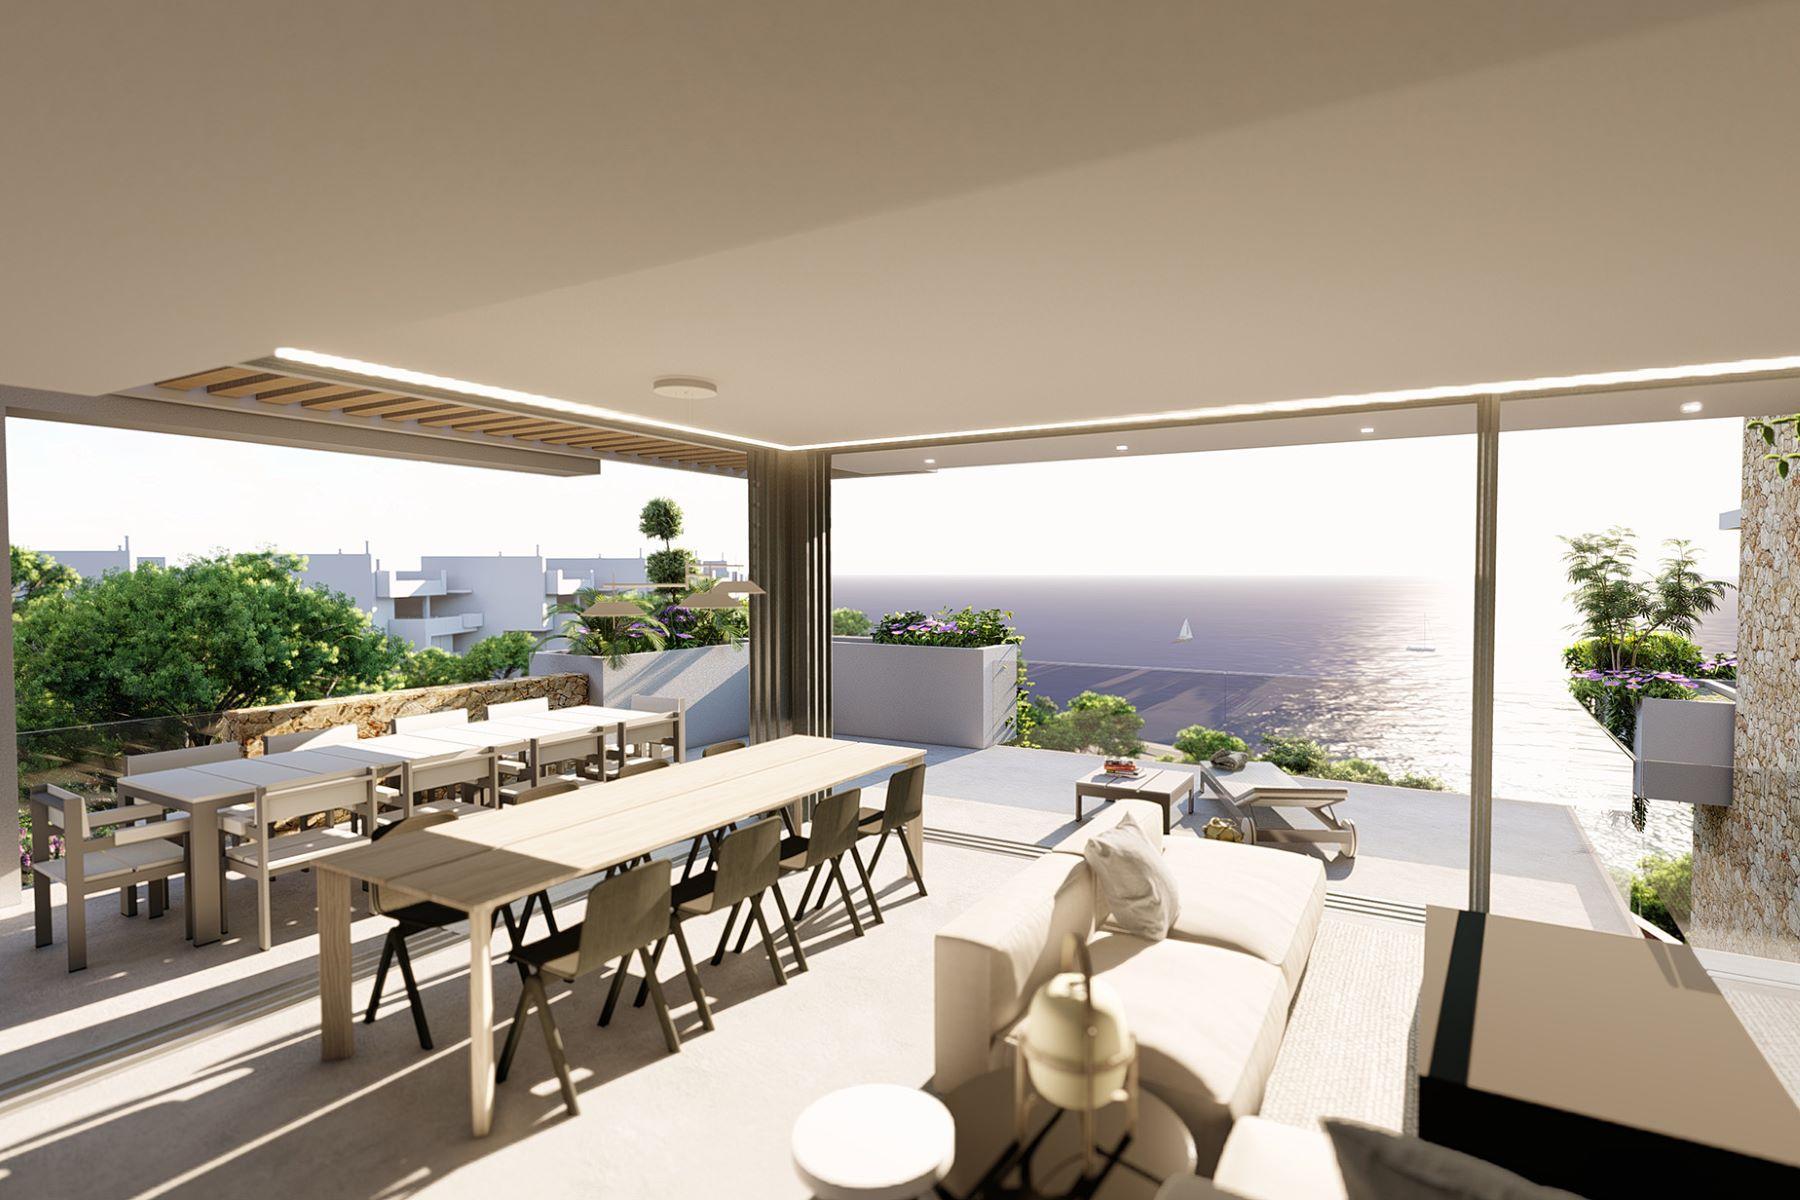 Single Family Home for Sale at House to live the pleasures of the Costa Brava Tamariu, Costa Brava, 17212 Spain